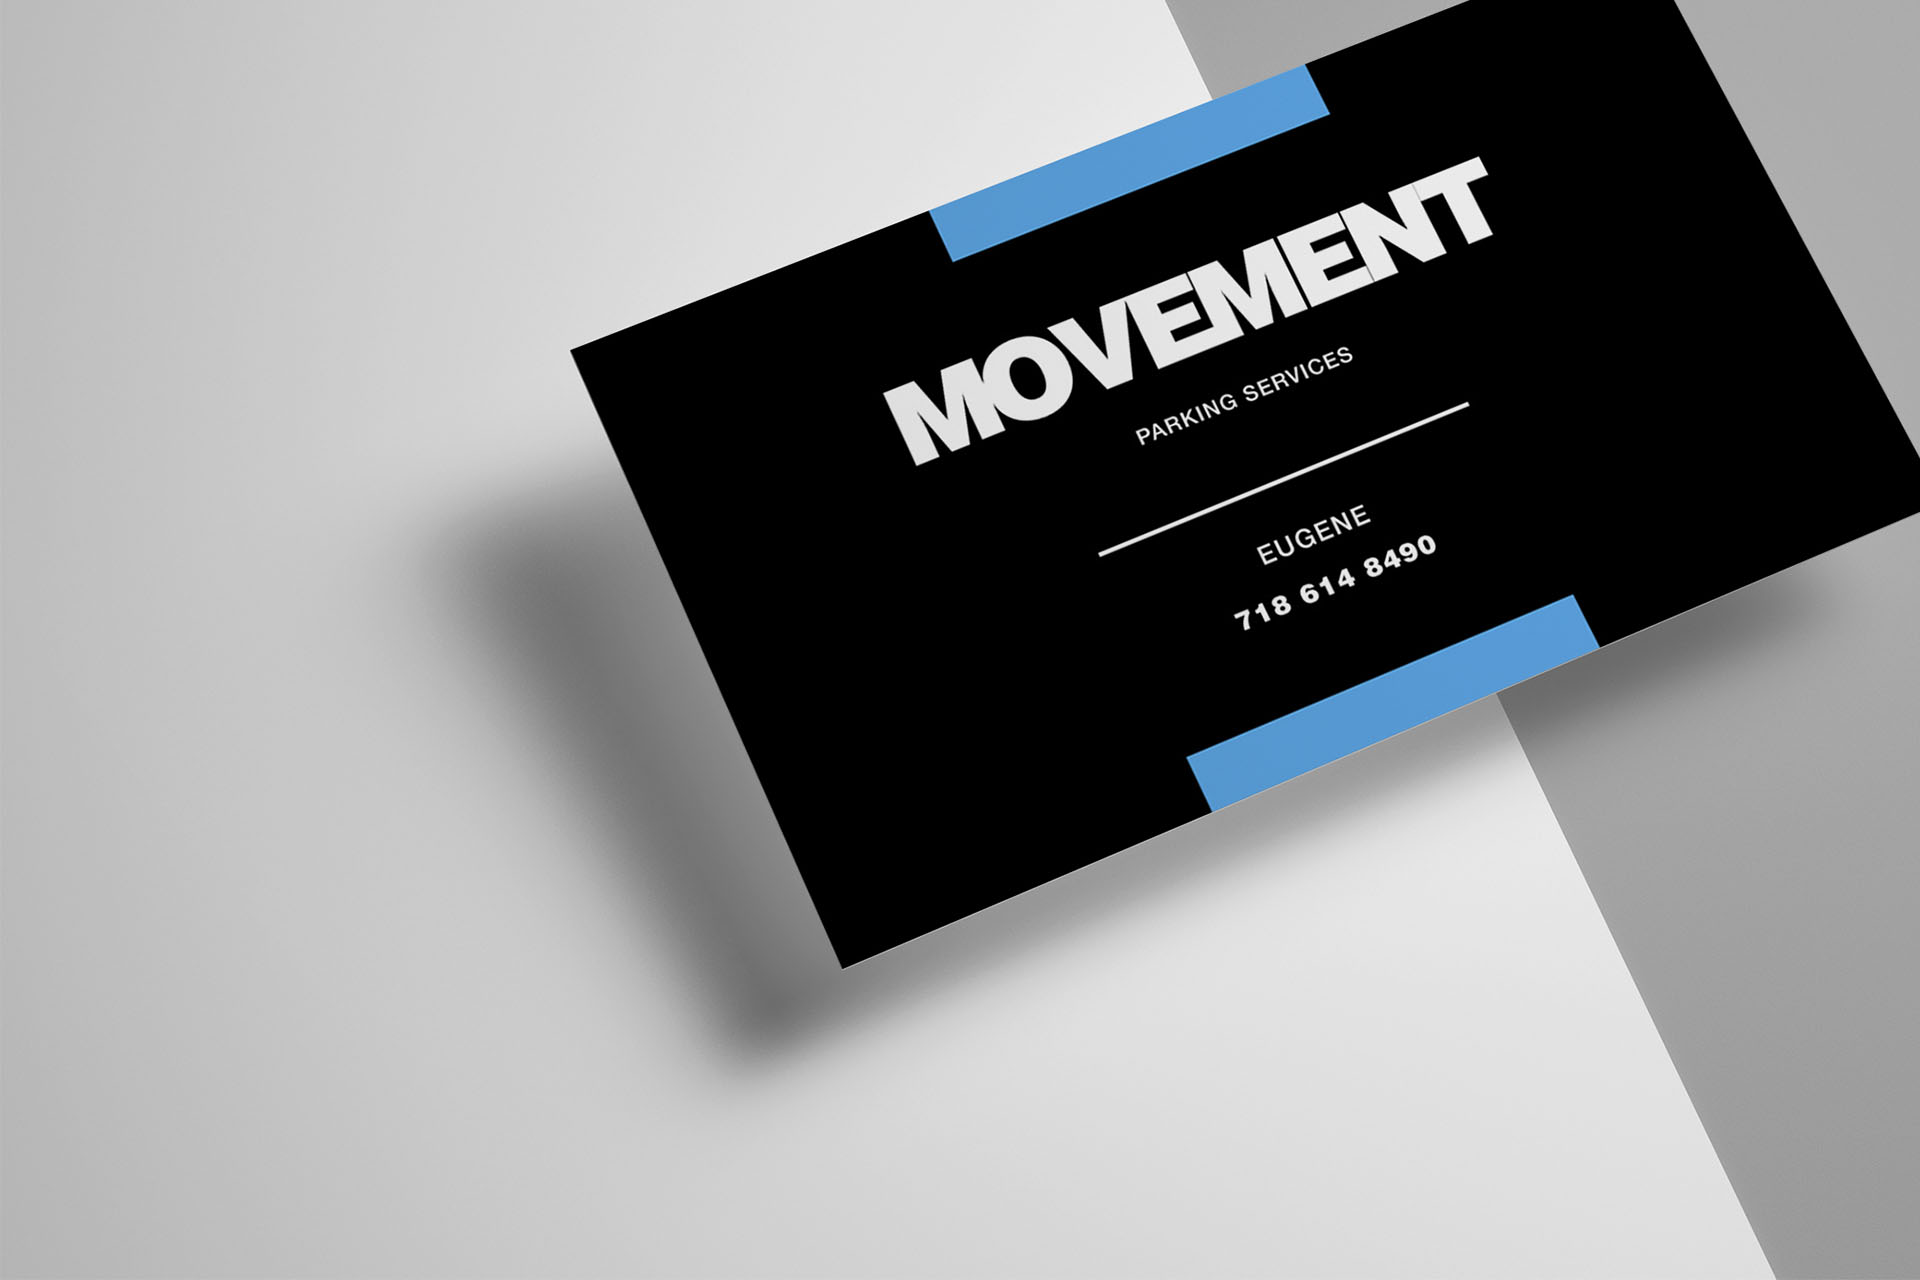 Movement Parking Services – Kromolith